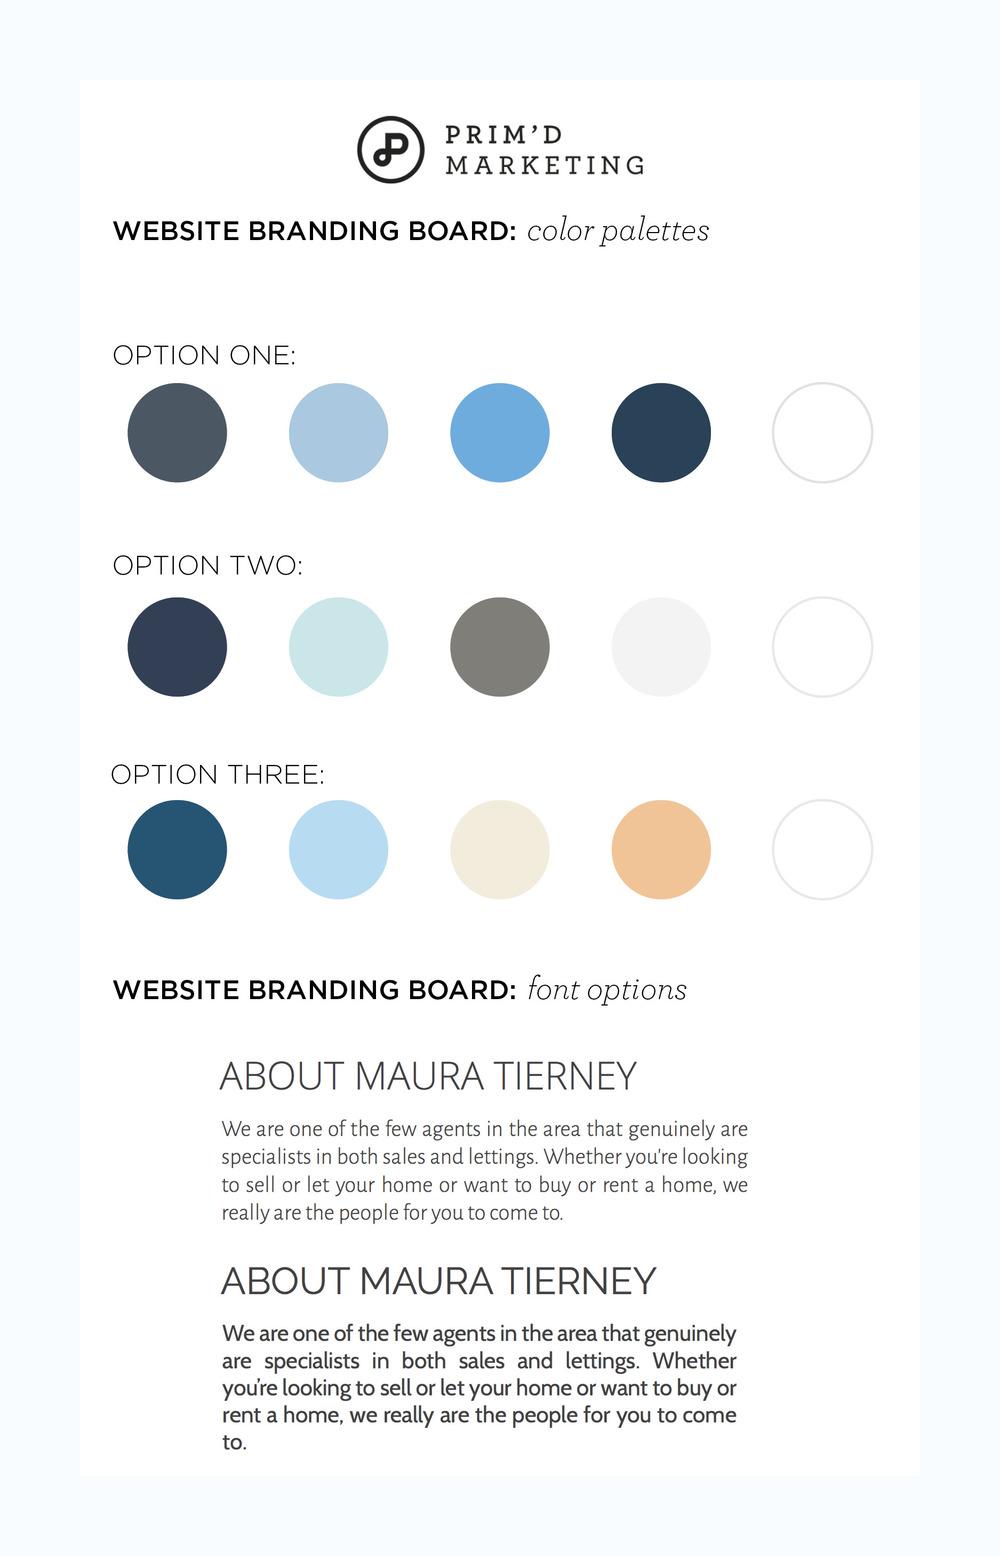 Primd Marketing - Case Study - Maura Tierney